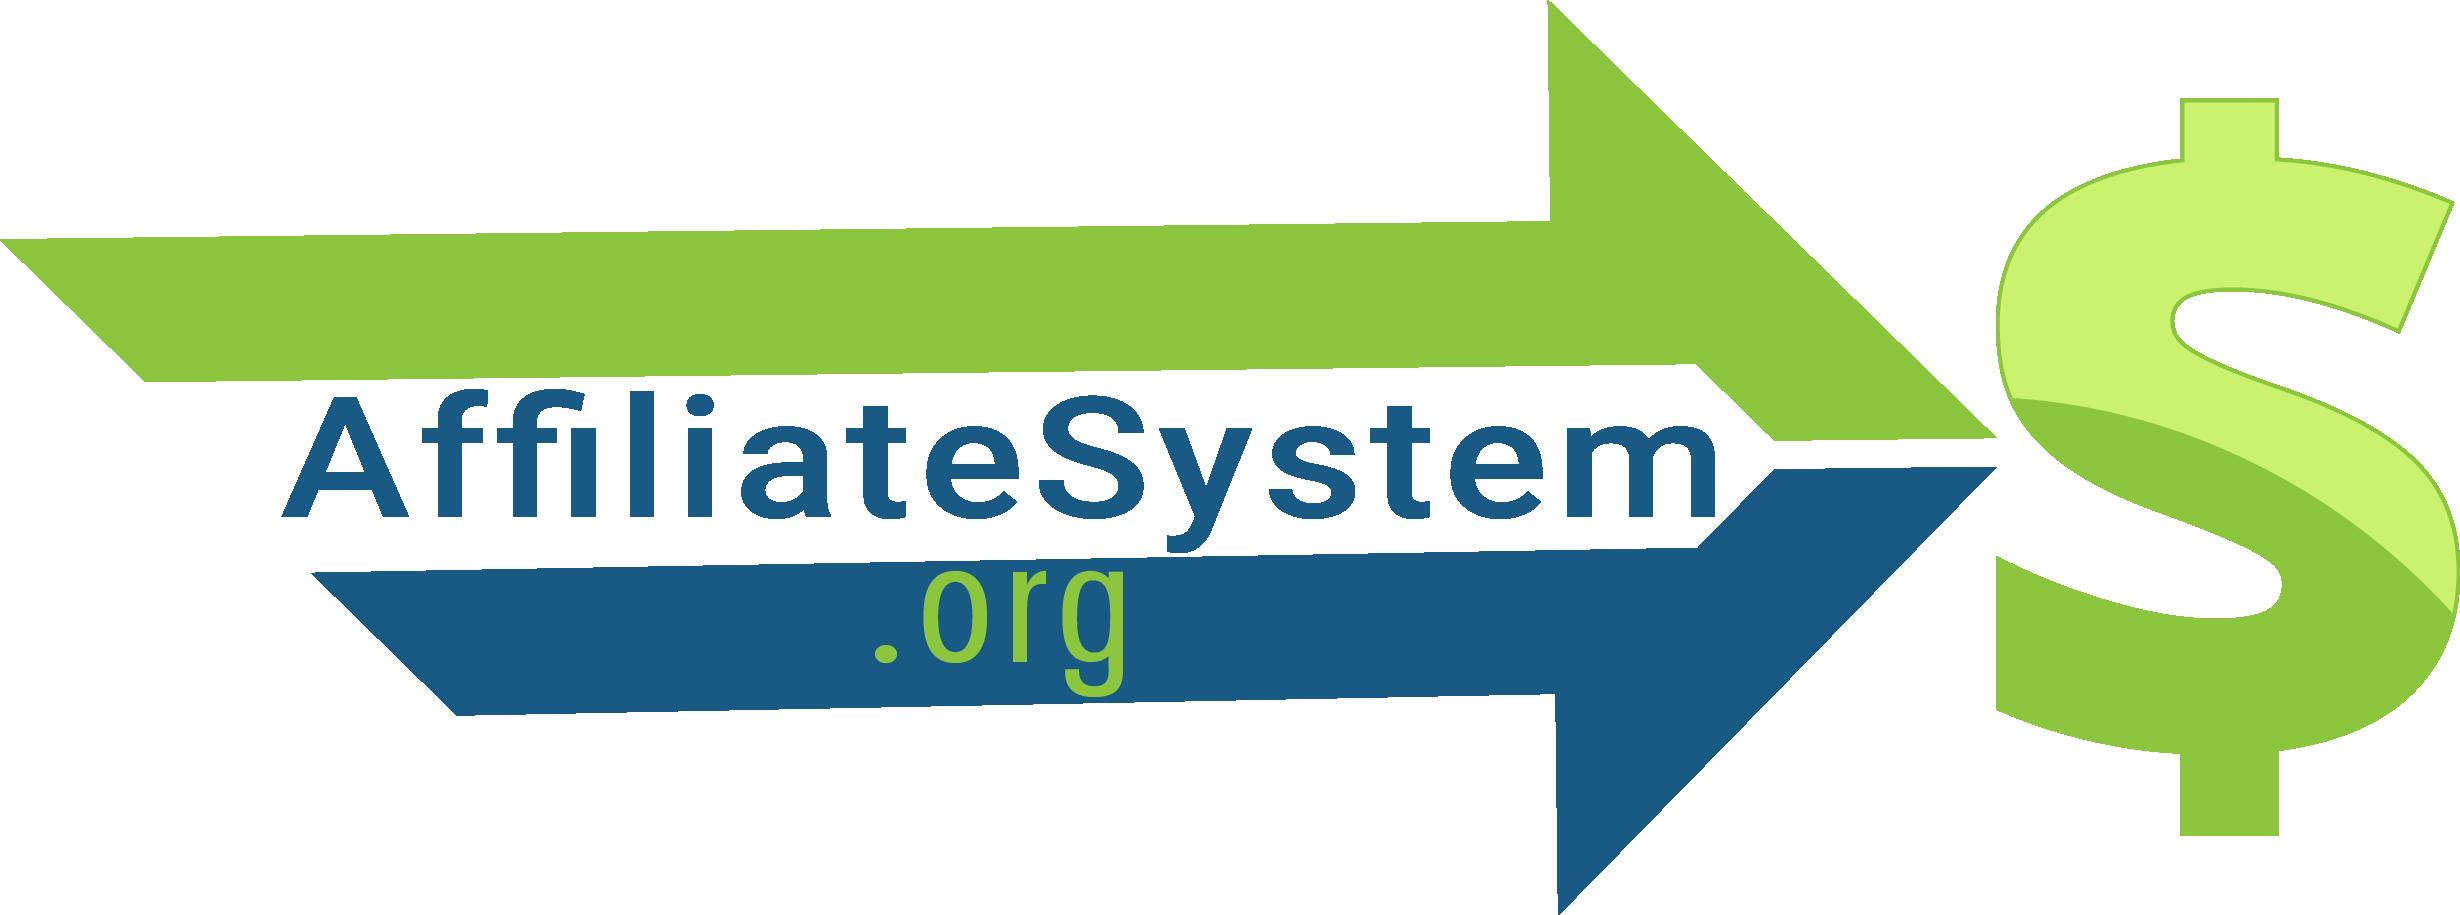 affiliatesystem.org